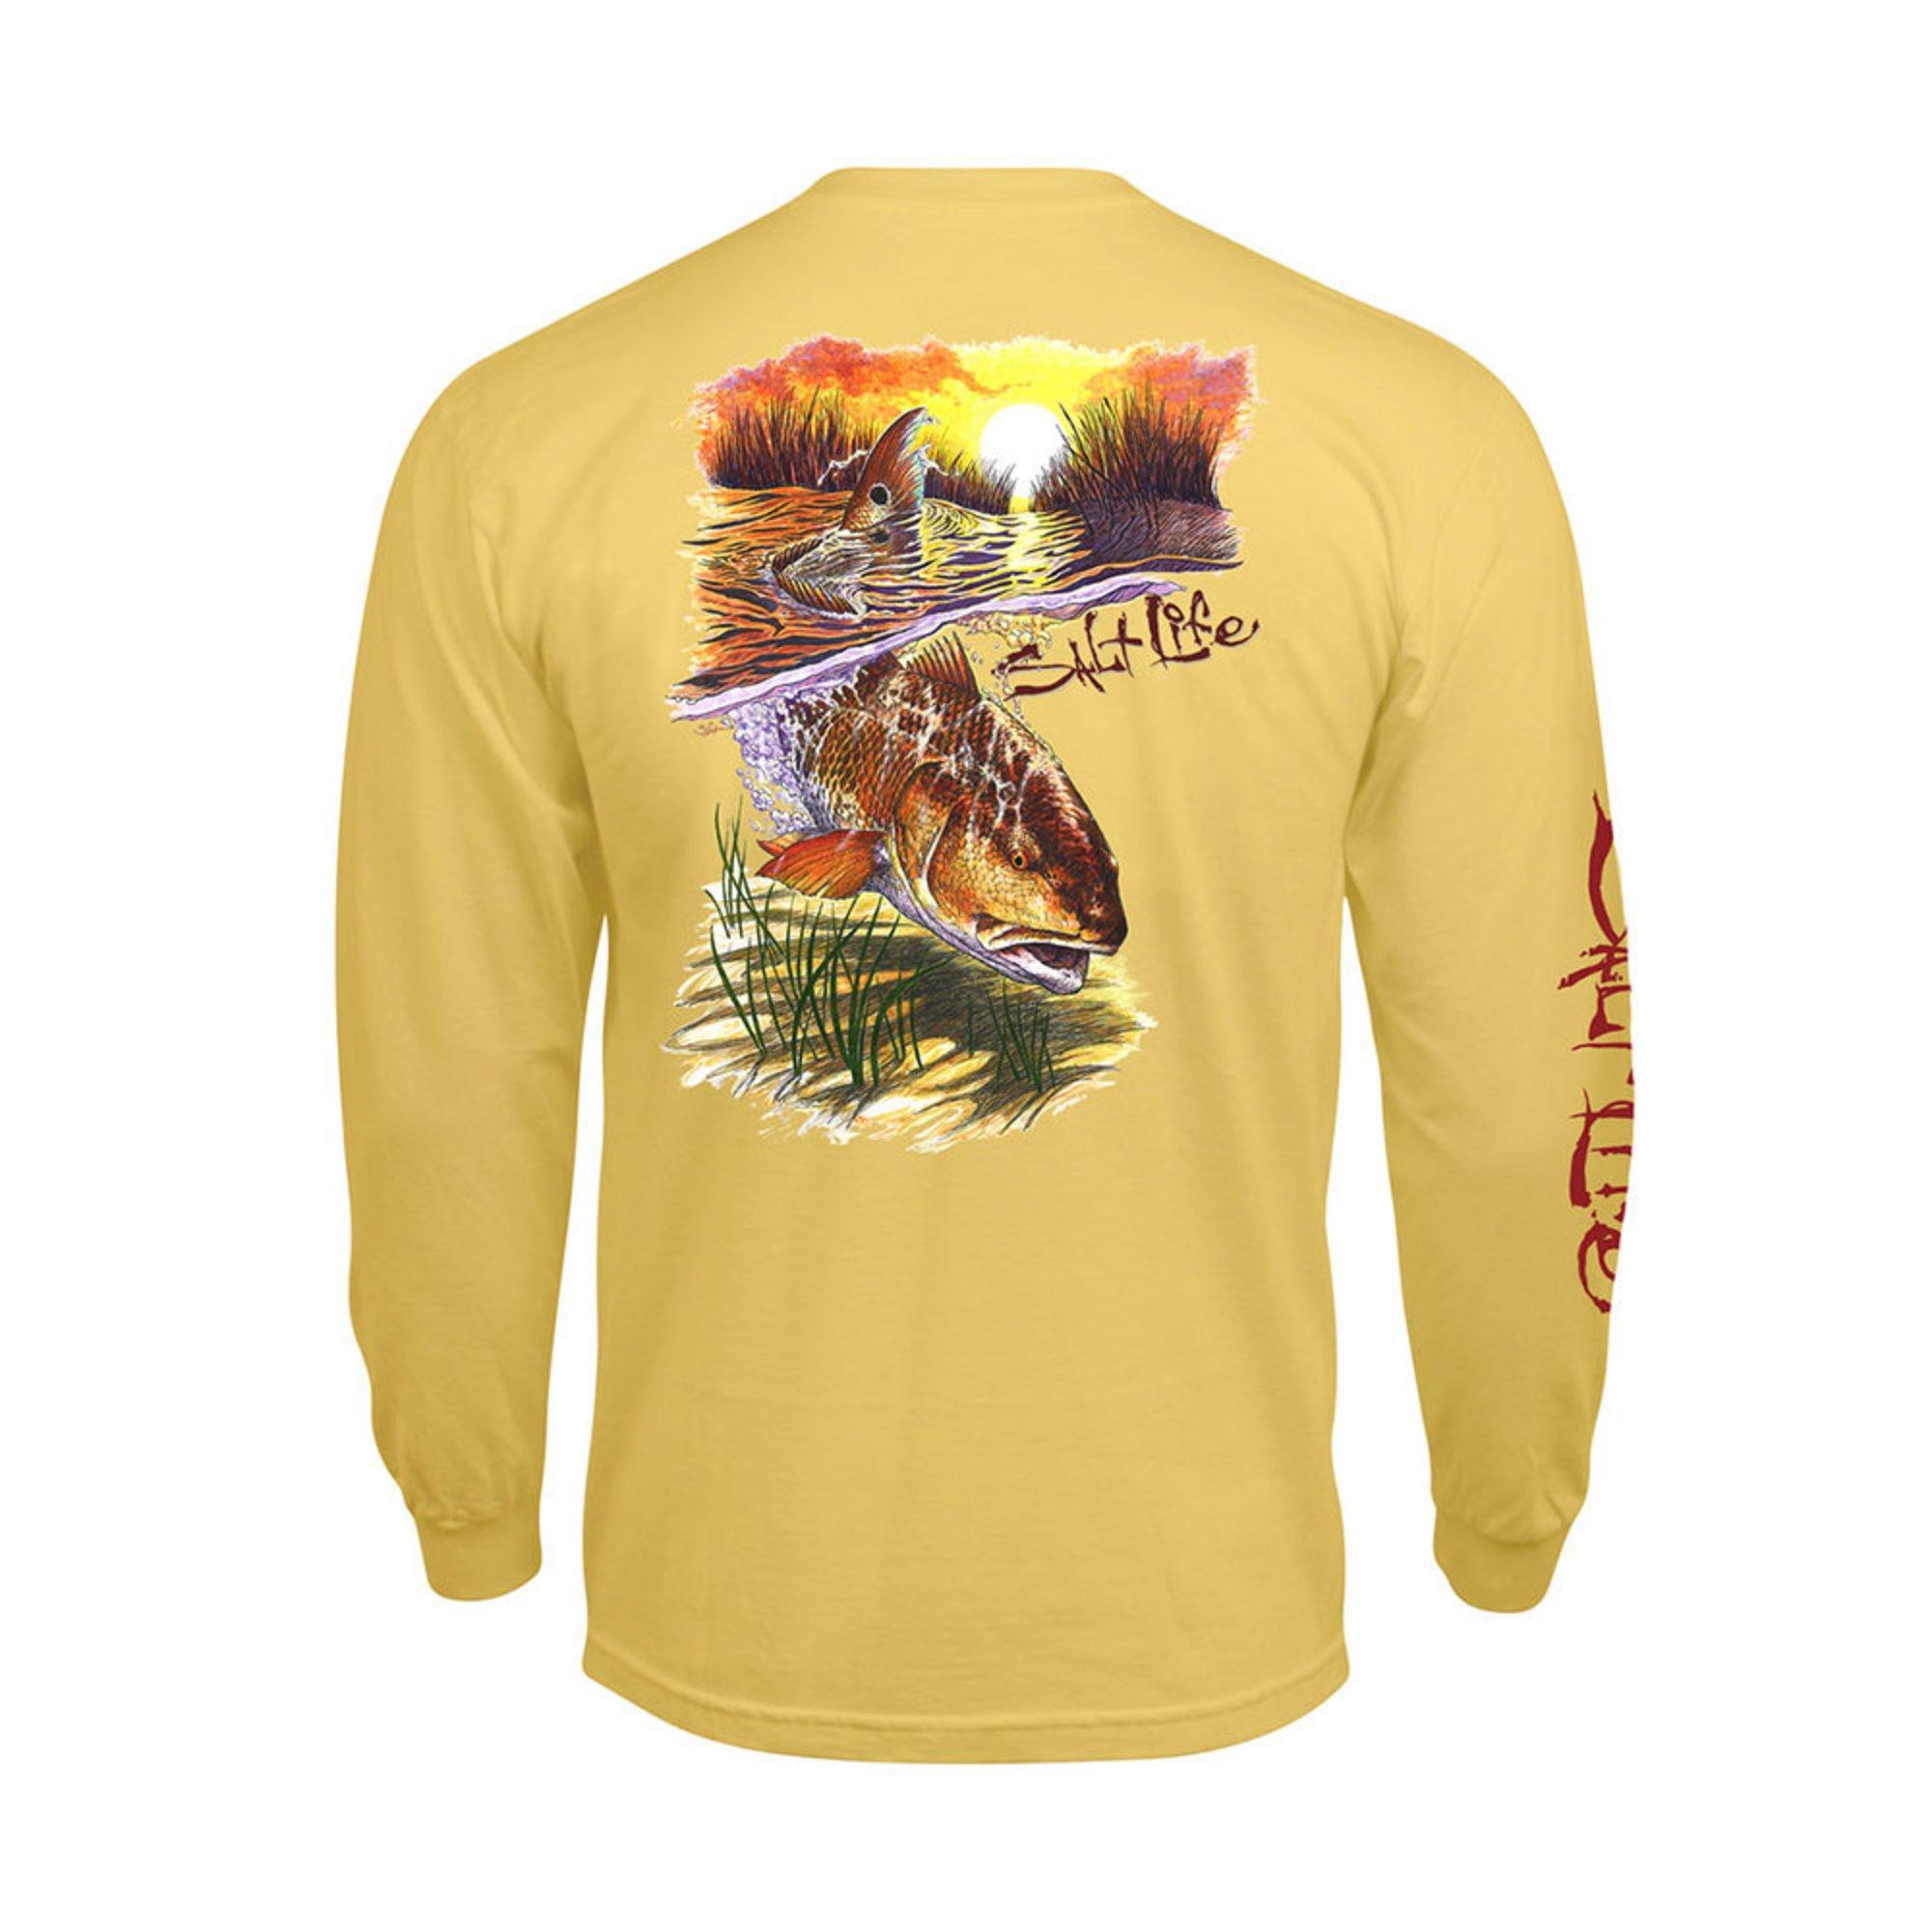 573727d6263c5 Salt Life Mens Long Sleeve Tee Bulldozing Red Yellow | Casual ...